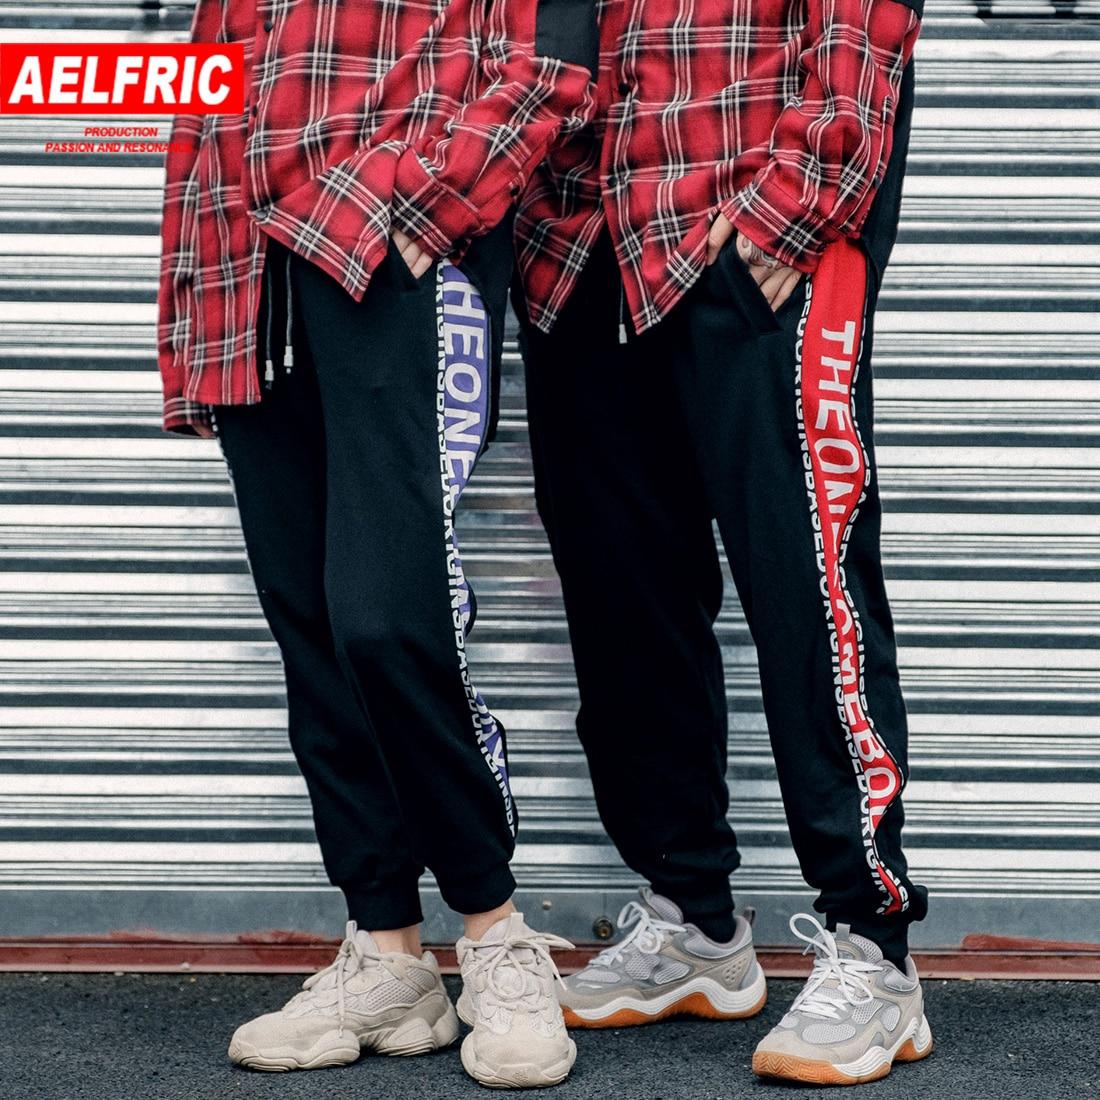 Reasonable Aelfric Hip Hop Pants Side Track Zipper Design Streetwear Women Fashion Trousers Printed Haren Pants Unisex Swearpants Kj348